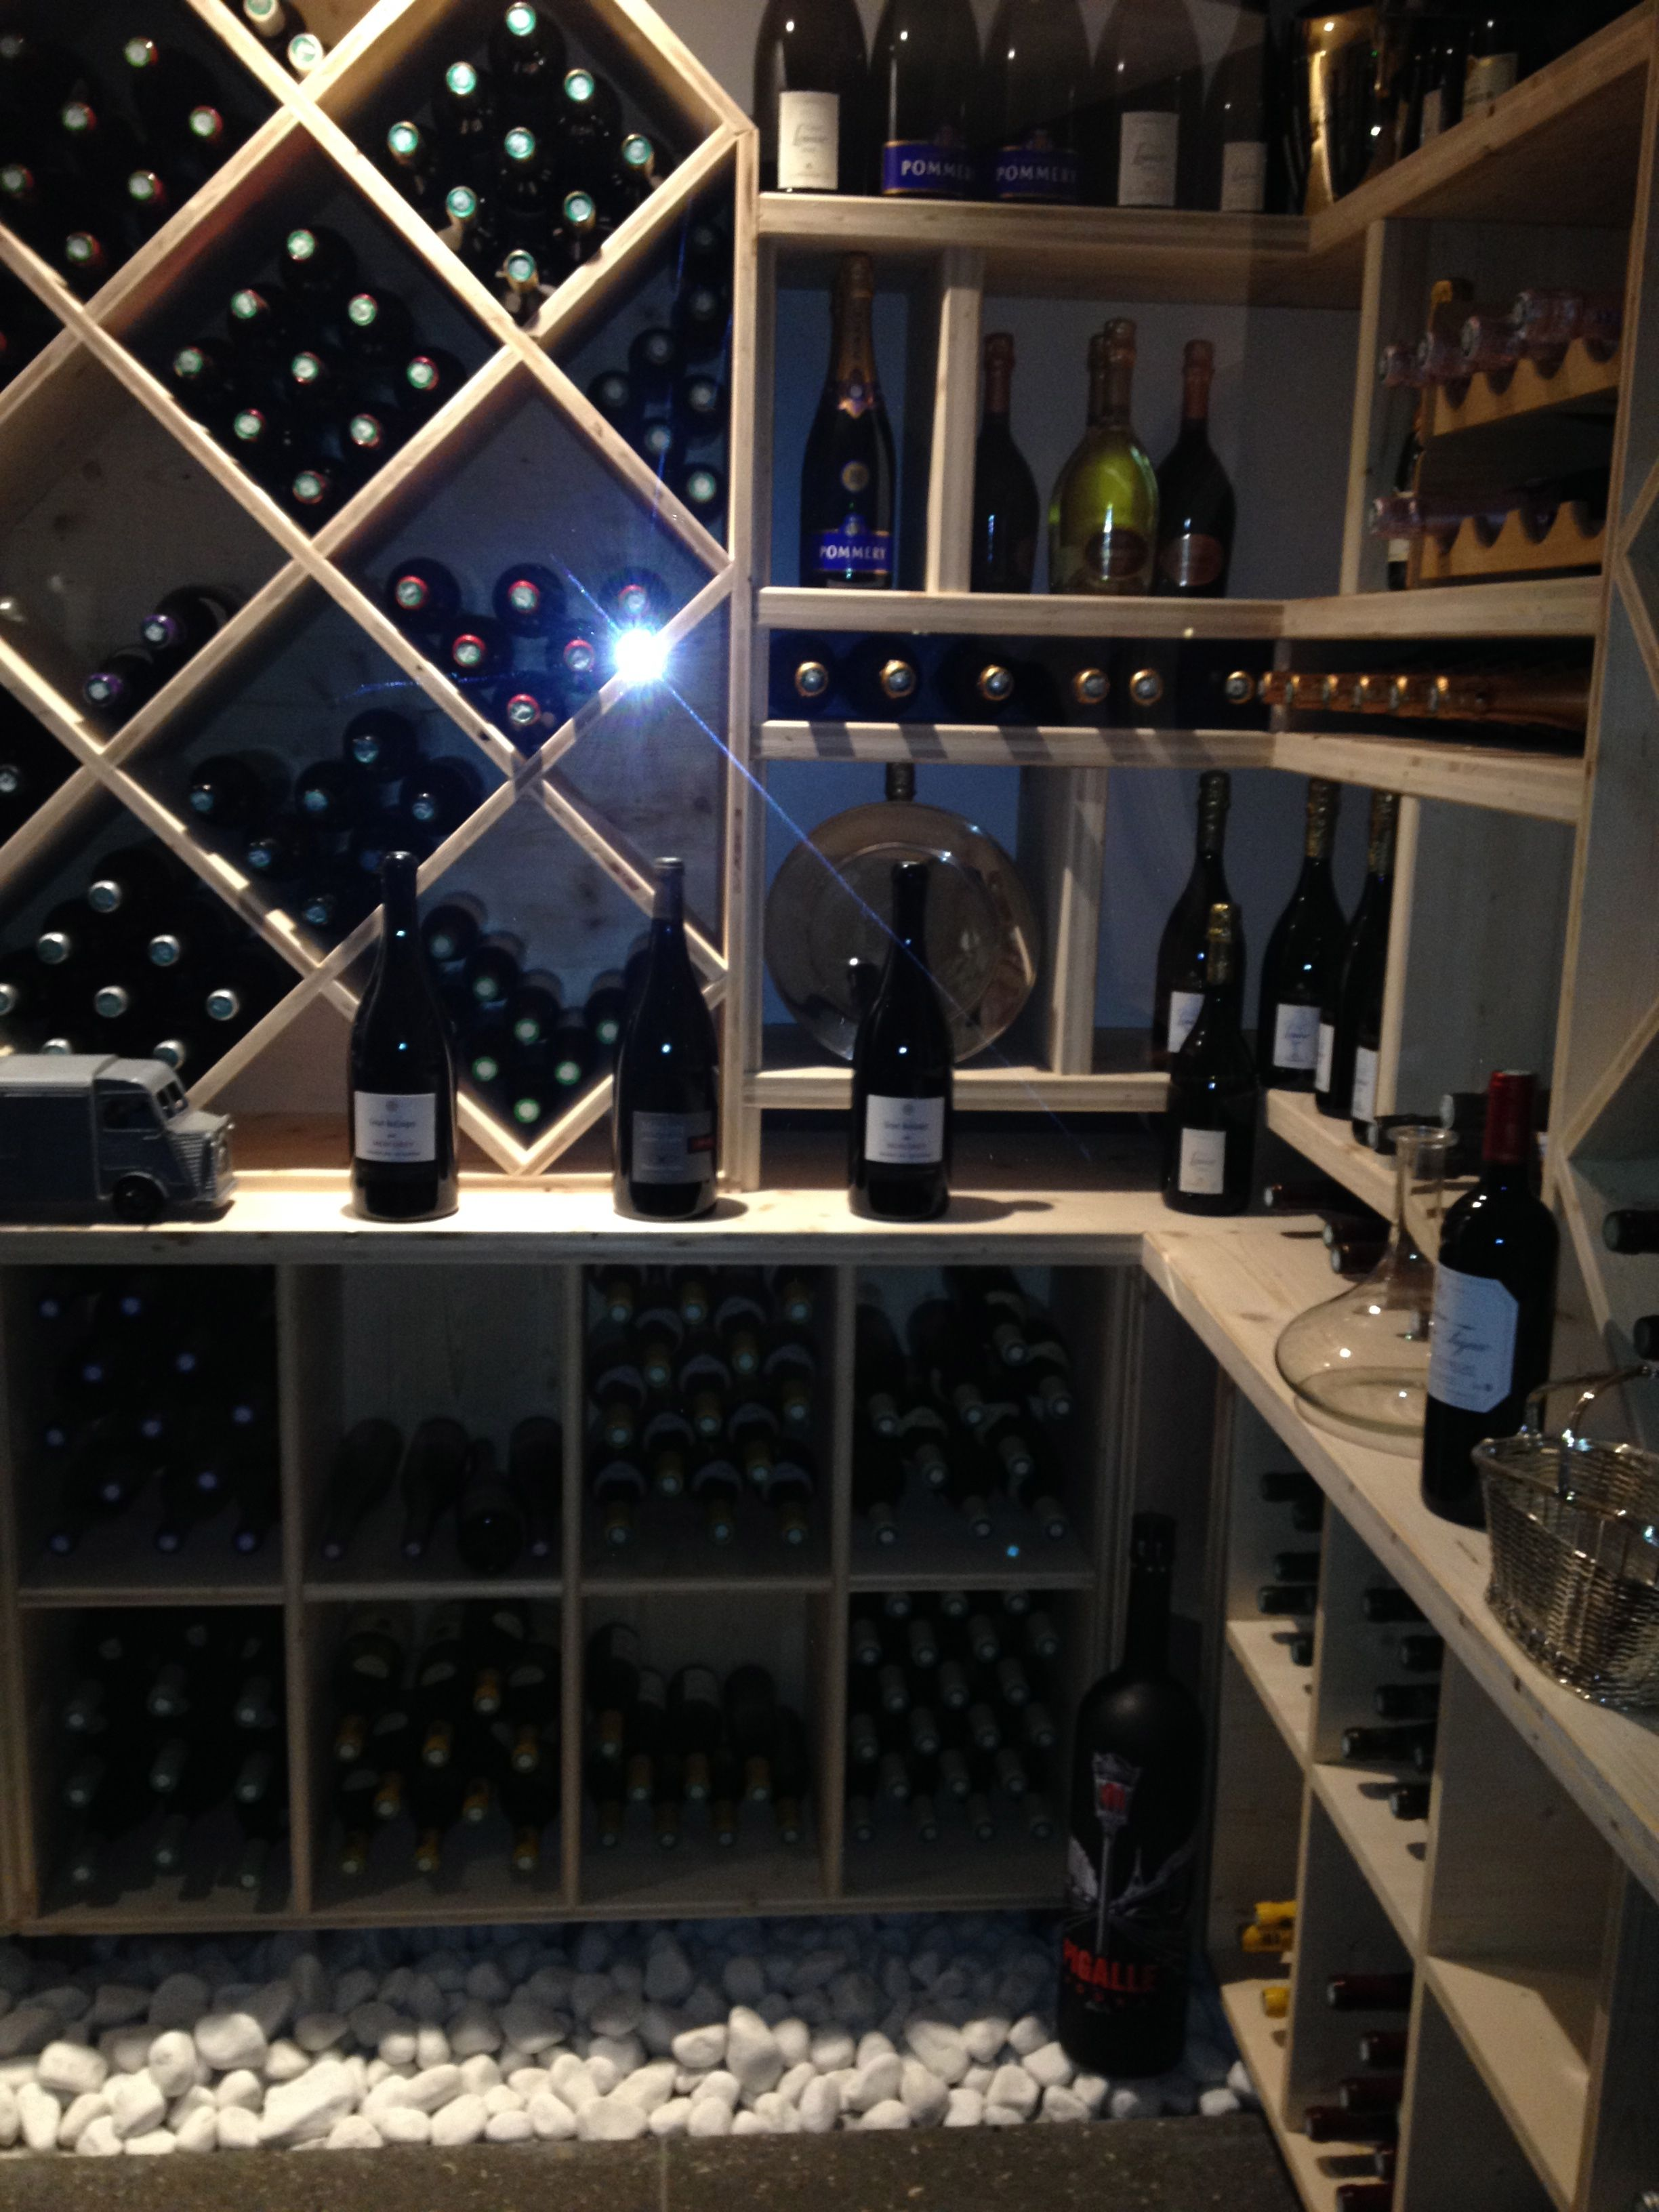 jolie cave vin cave vin cave vin cave a vin design et tag res bouteilles de vin. Black Bedroom Furniture Sets. Home Design Ideas